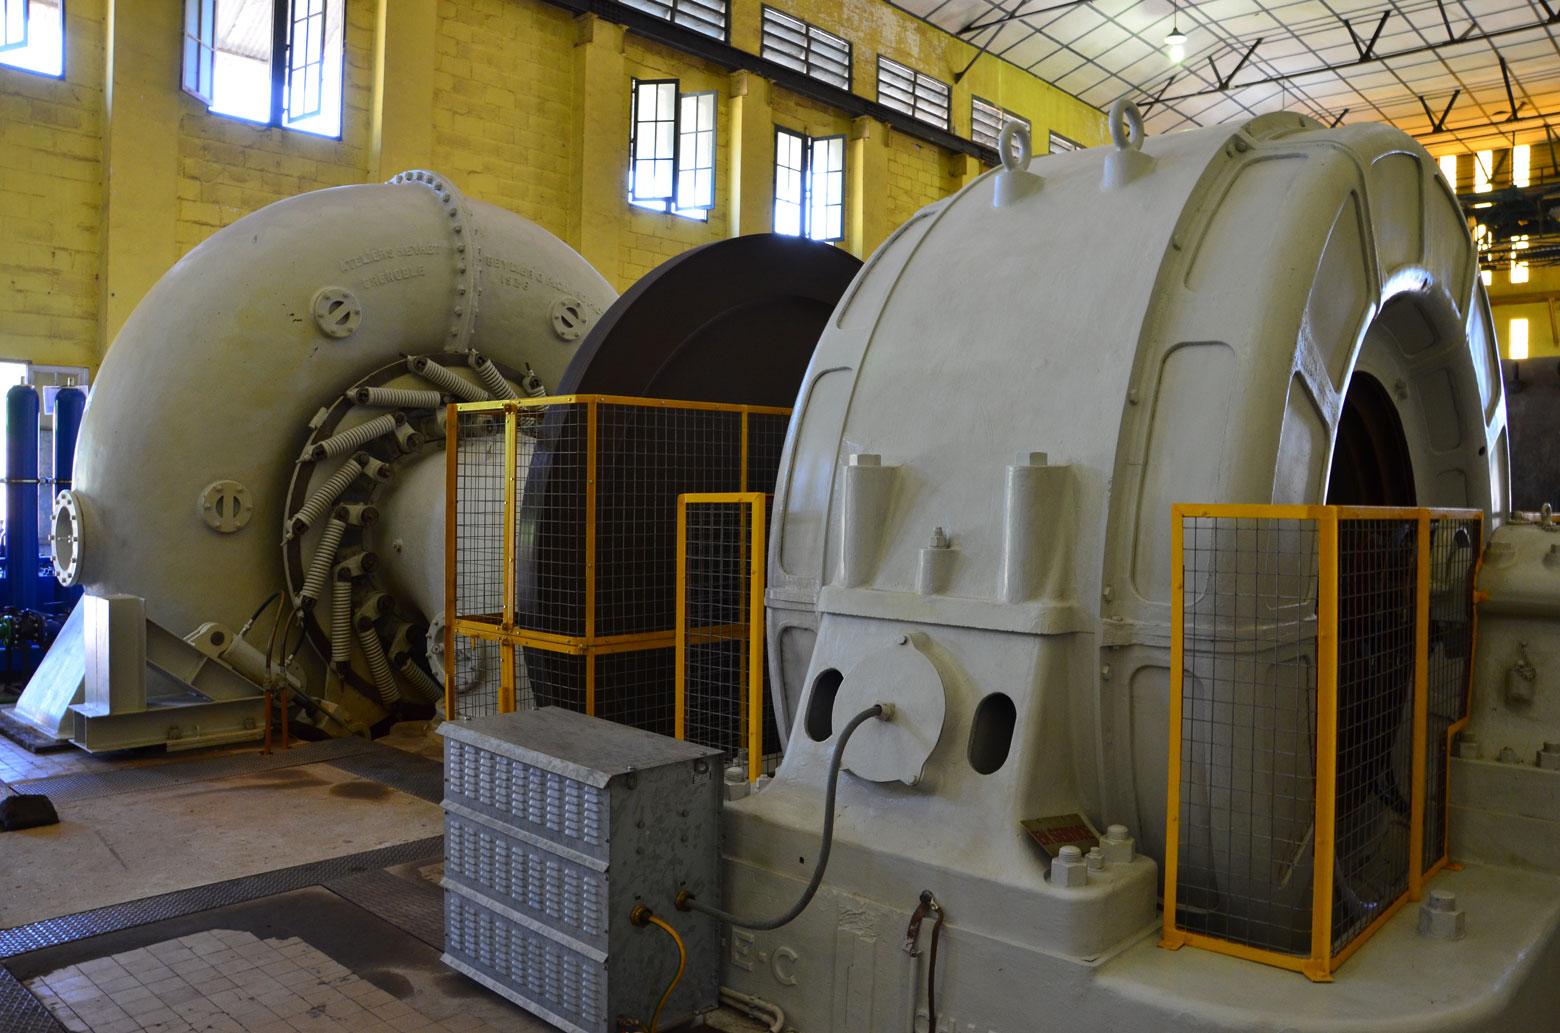 Groupe turbo-alternateur de la centrale de Sanga